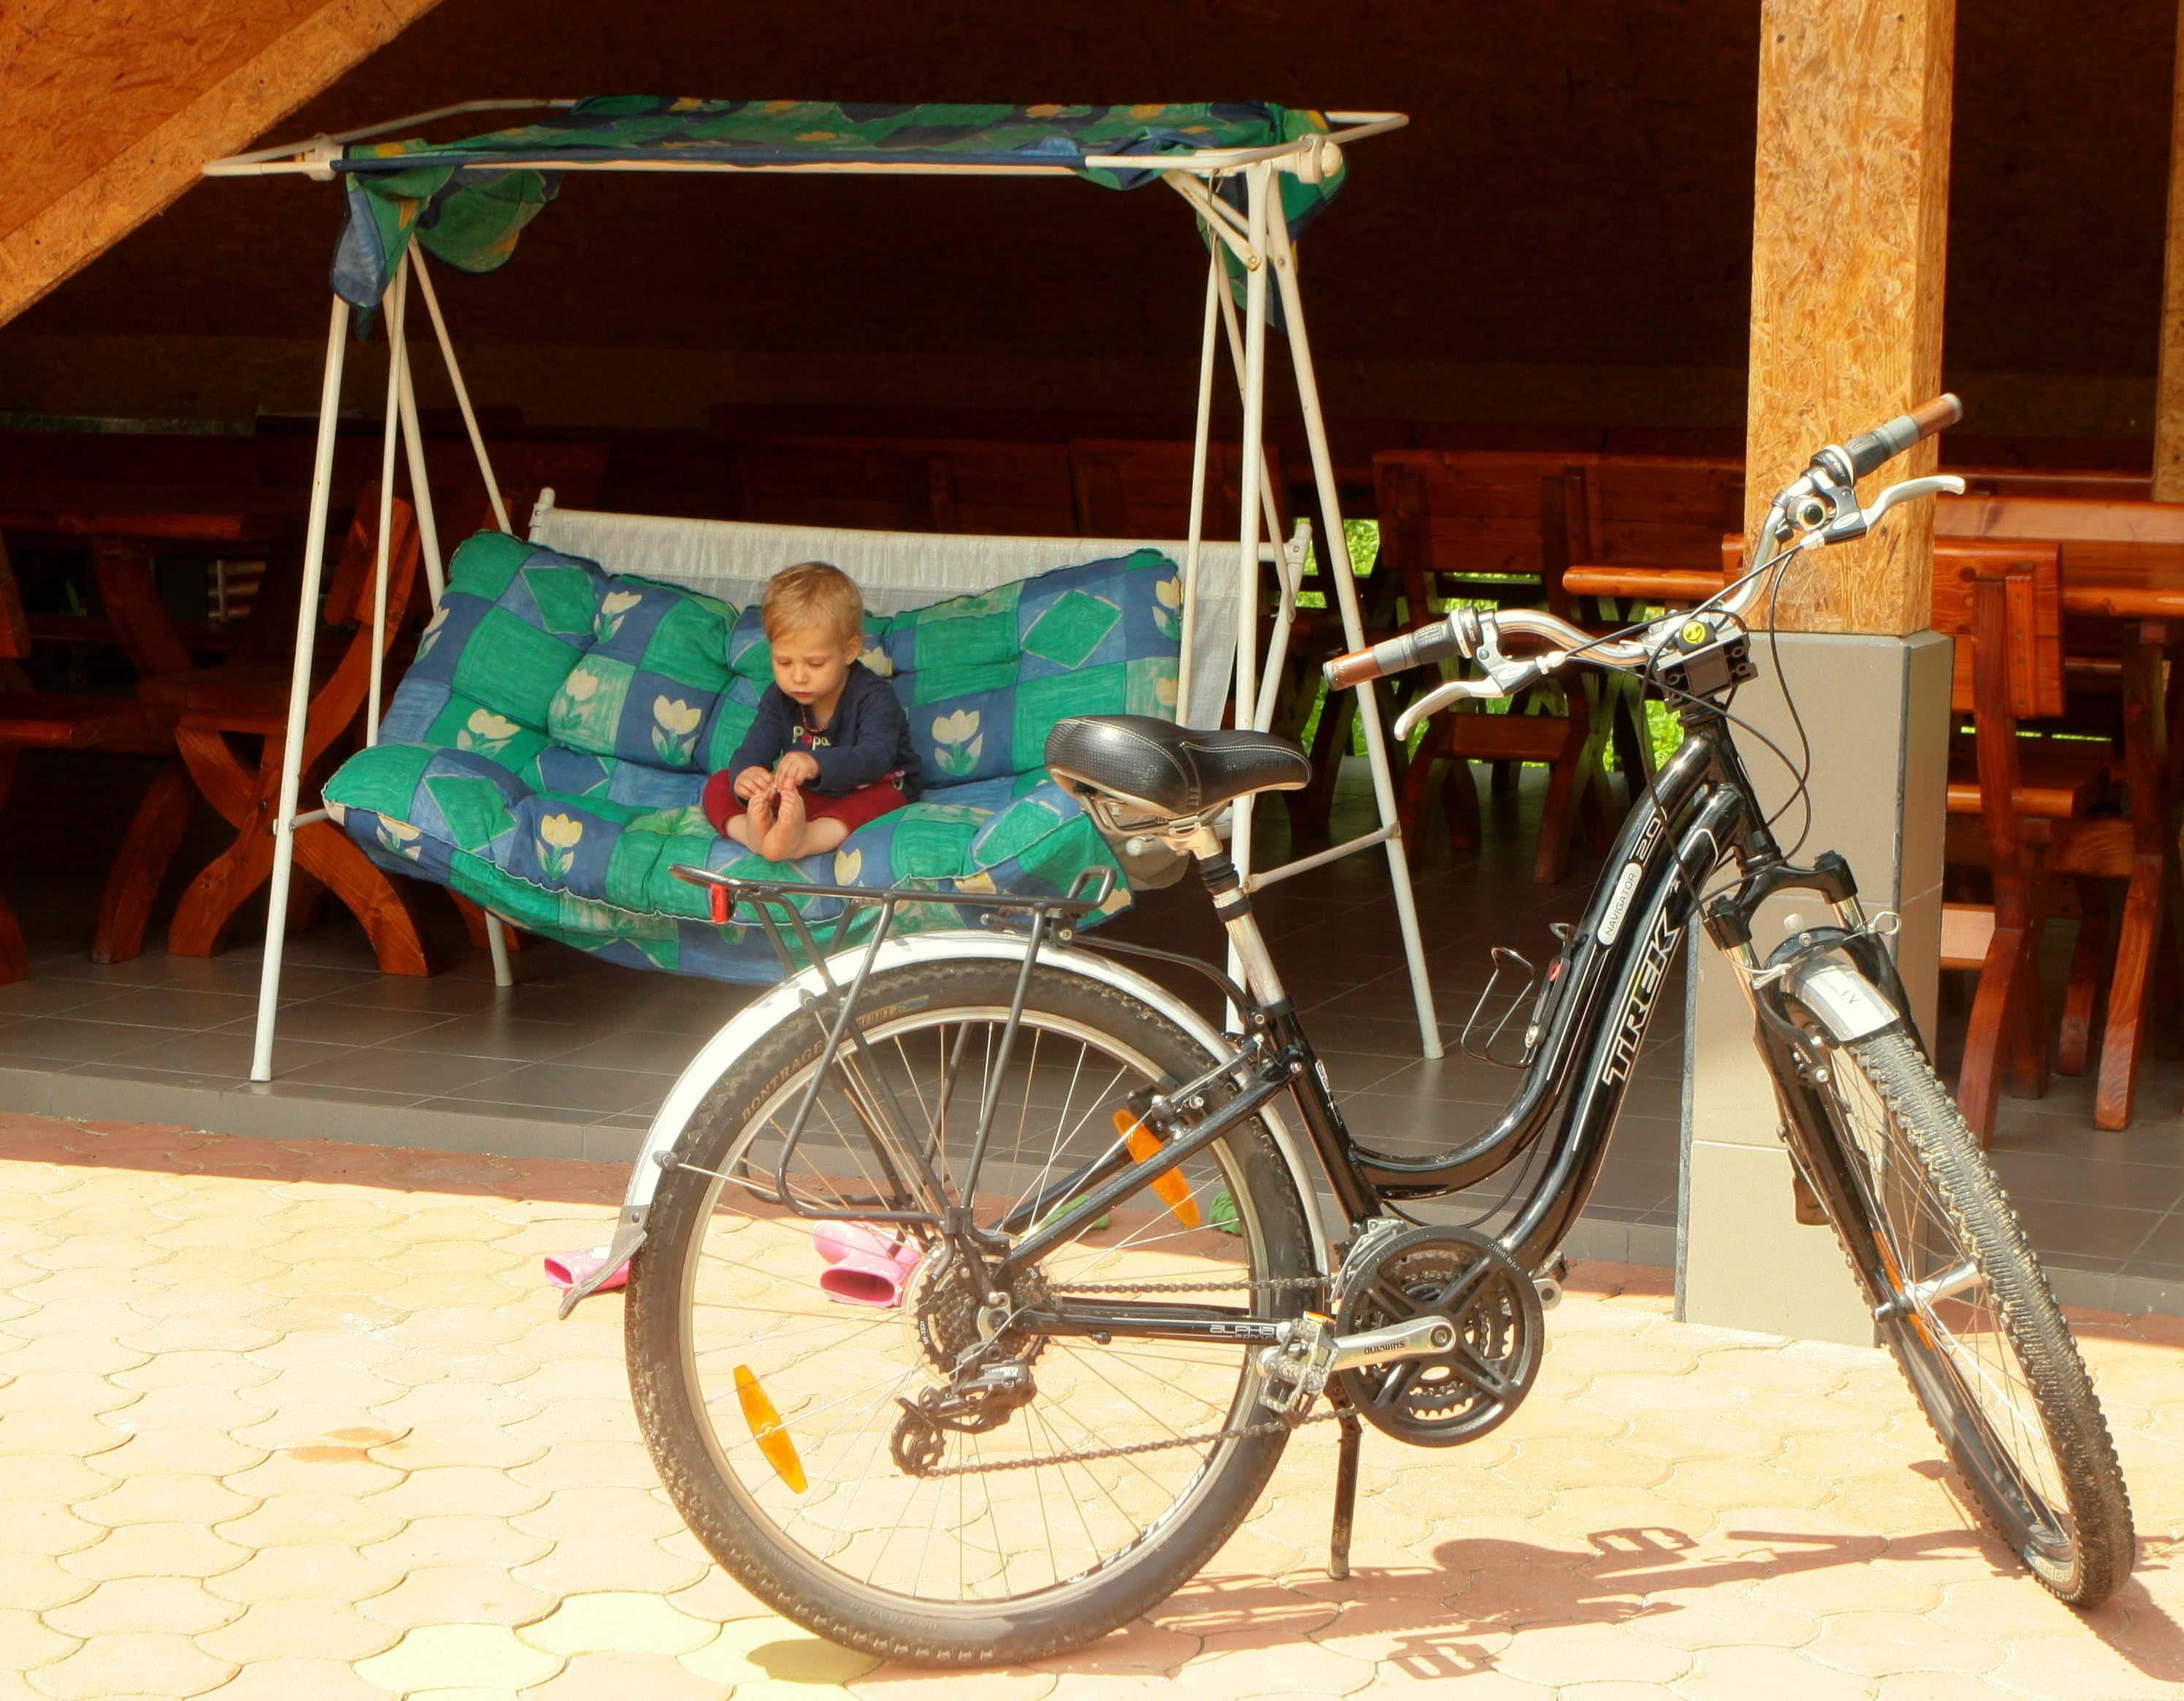 Tara frumoasa. Biciclete. Aventur(i)a de UrbanKid.ro